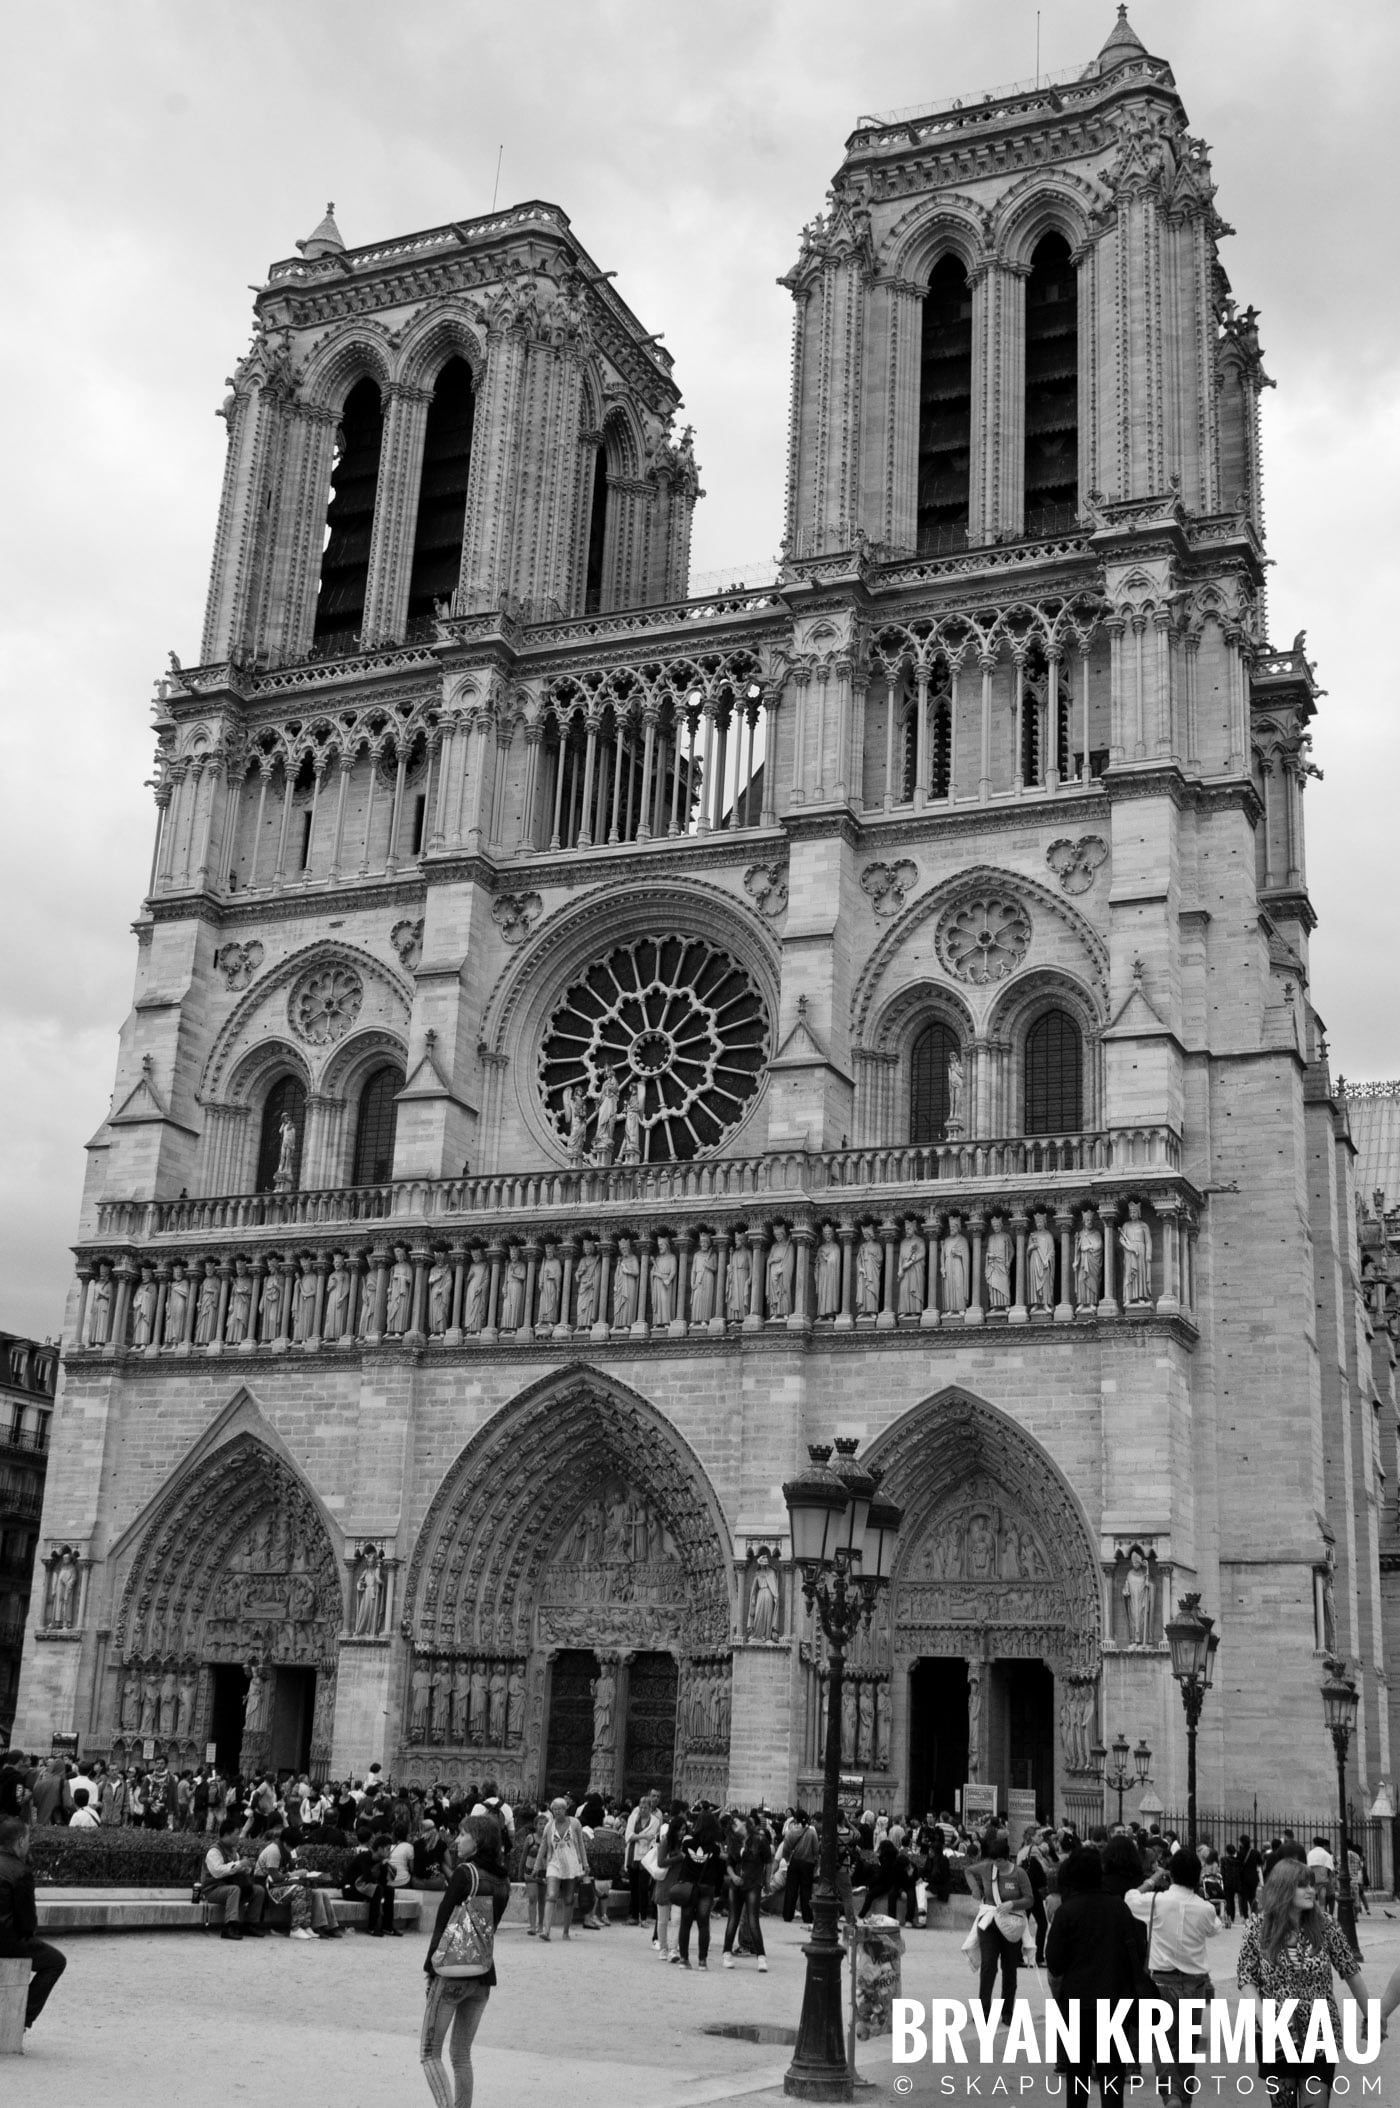 Paris, France Honeymoon - Day 4 - 7.21.11 (3)